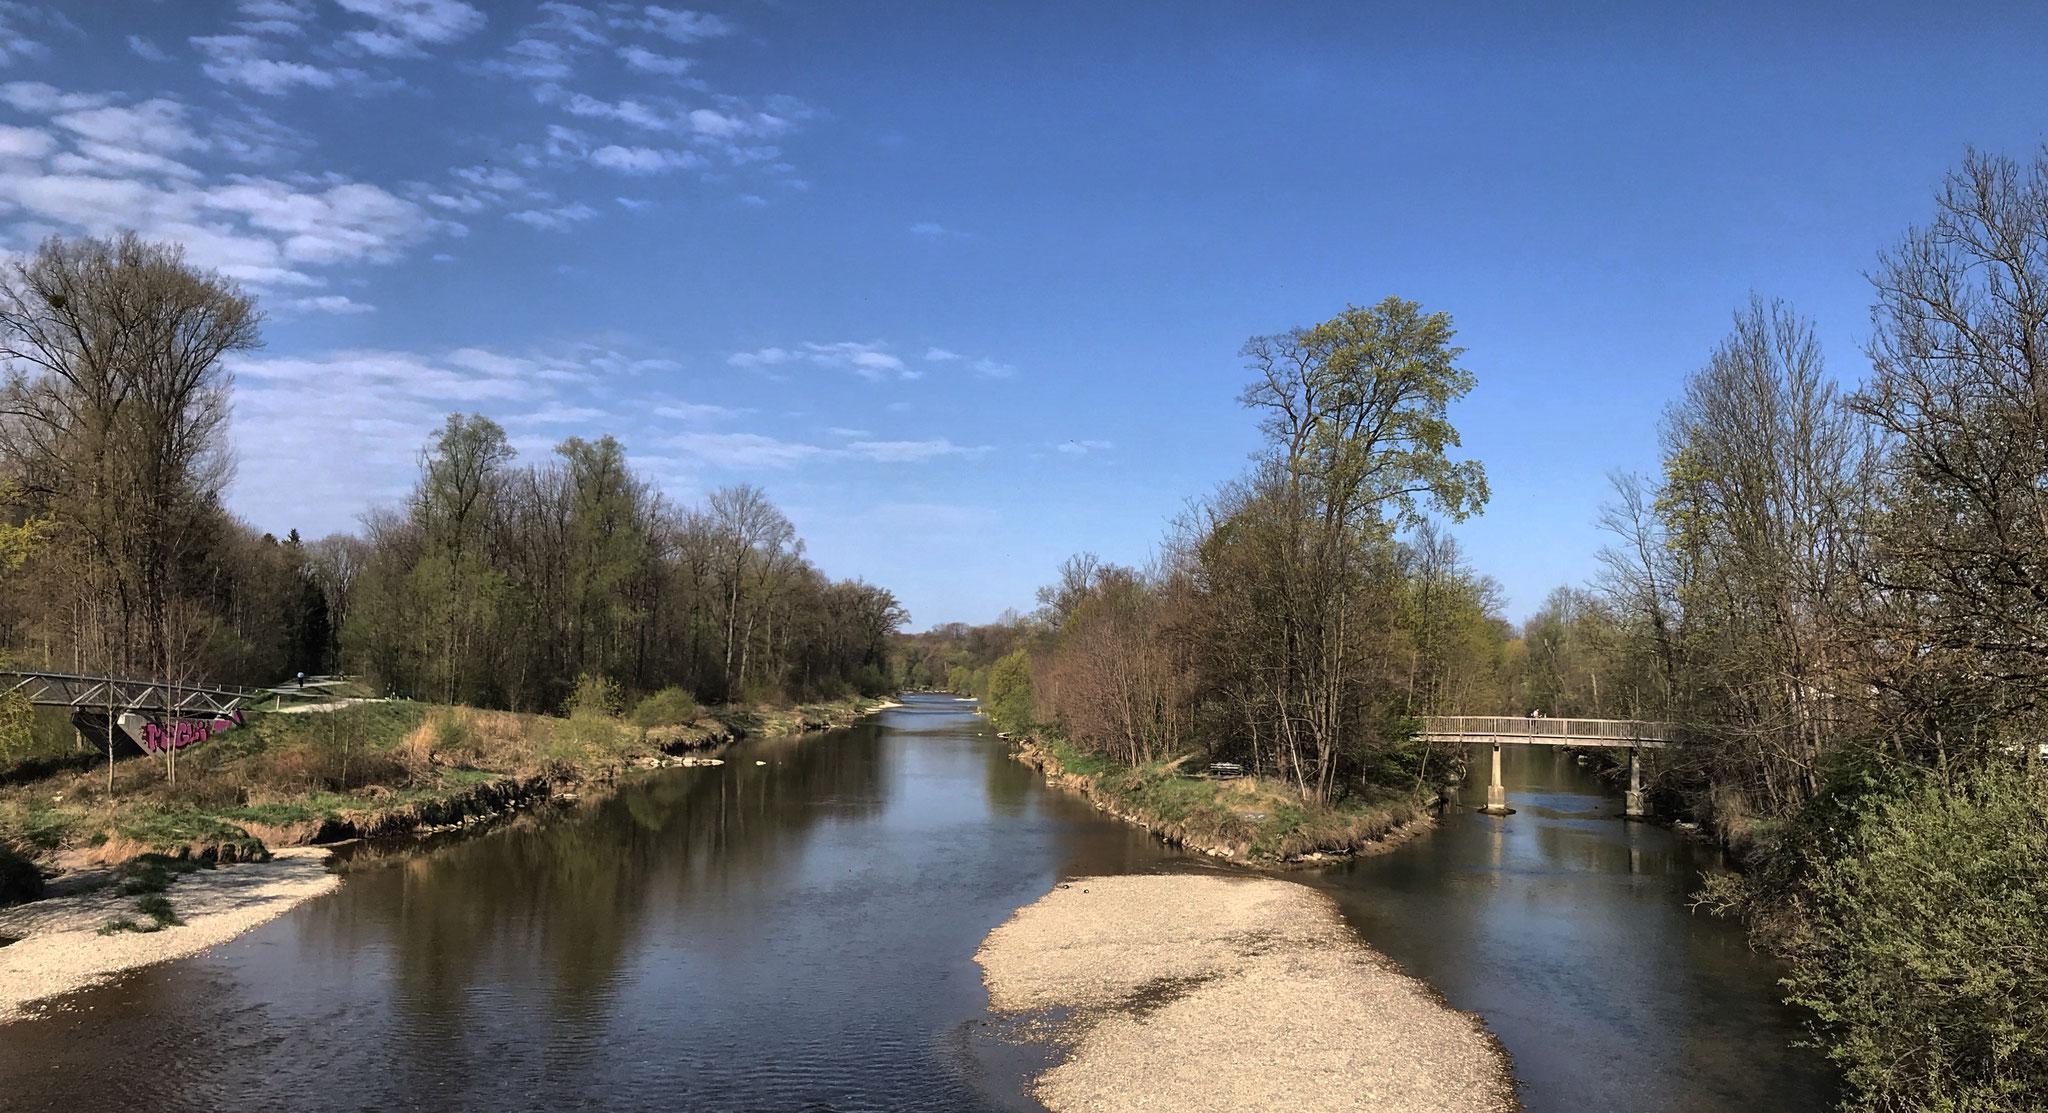 Etappe O01: Rosenheim - Happing